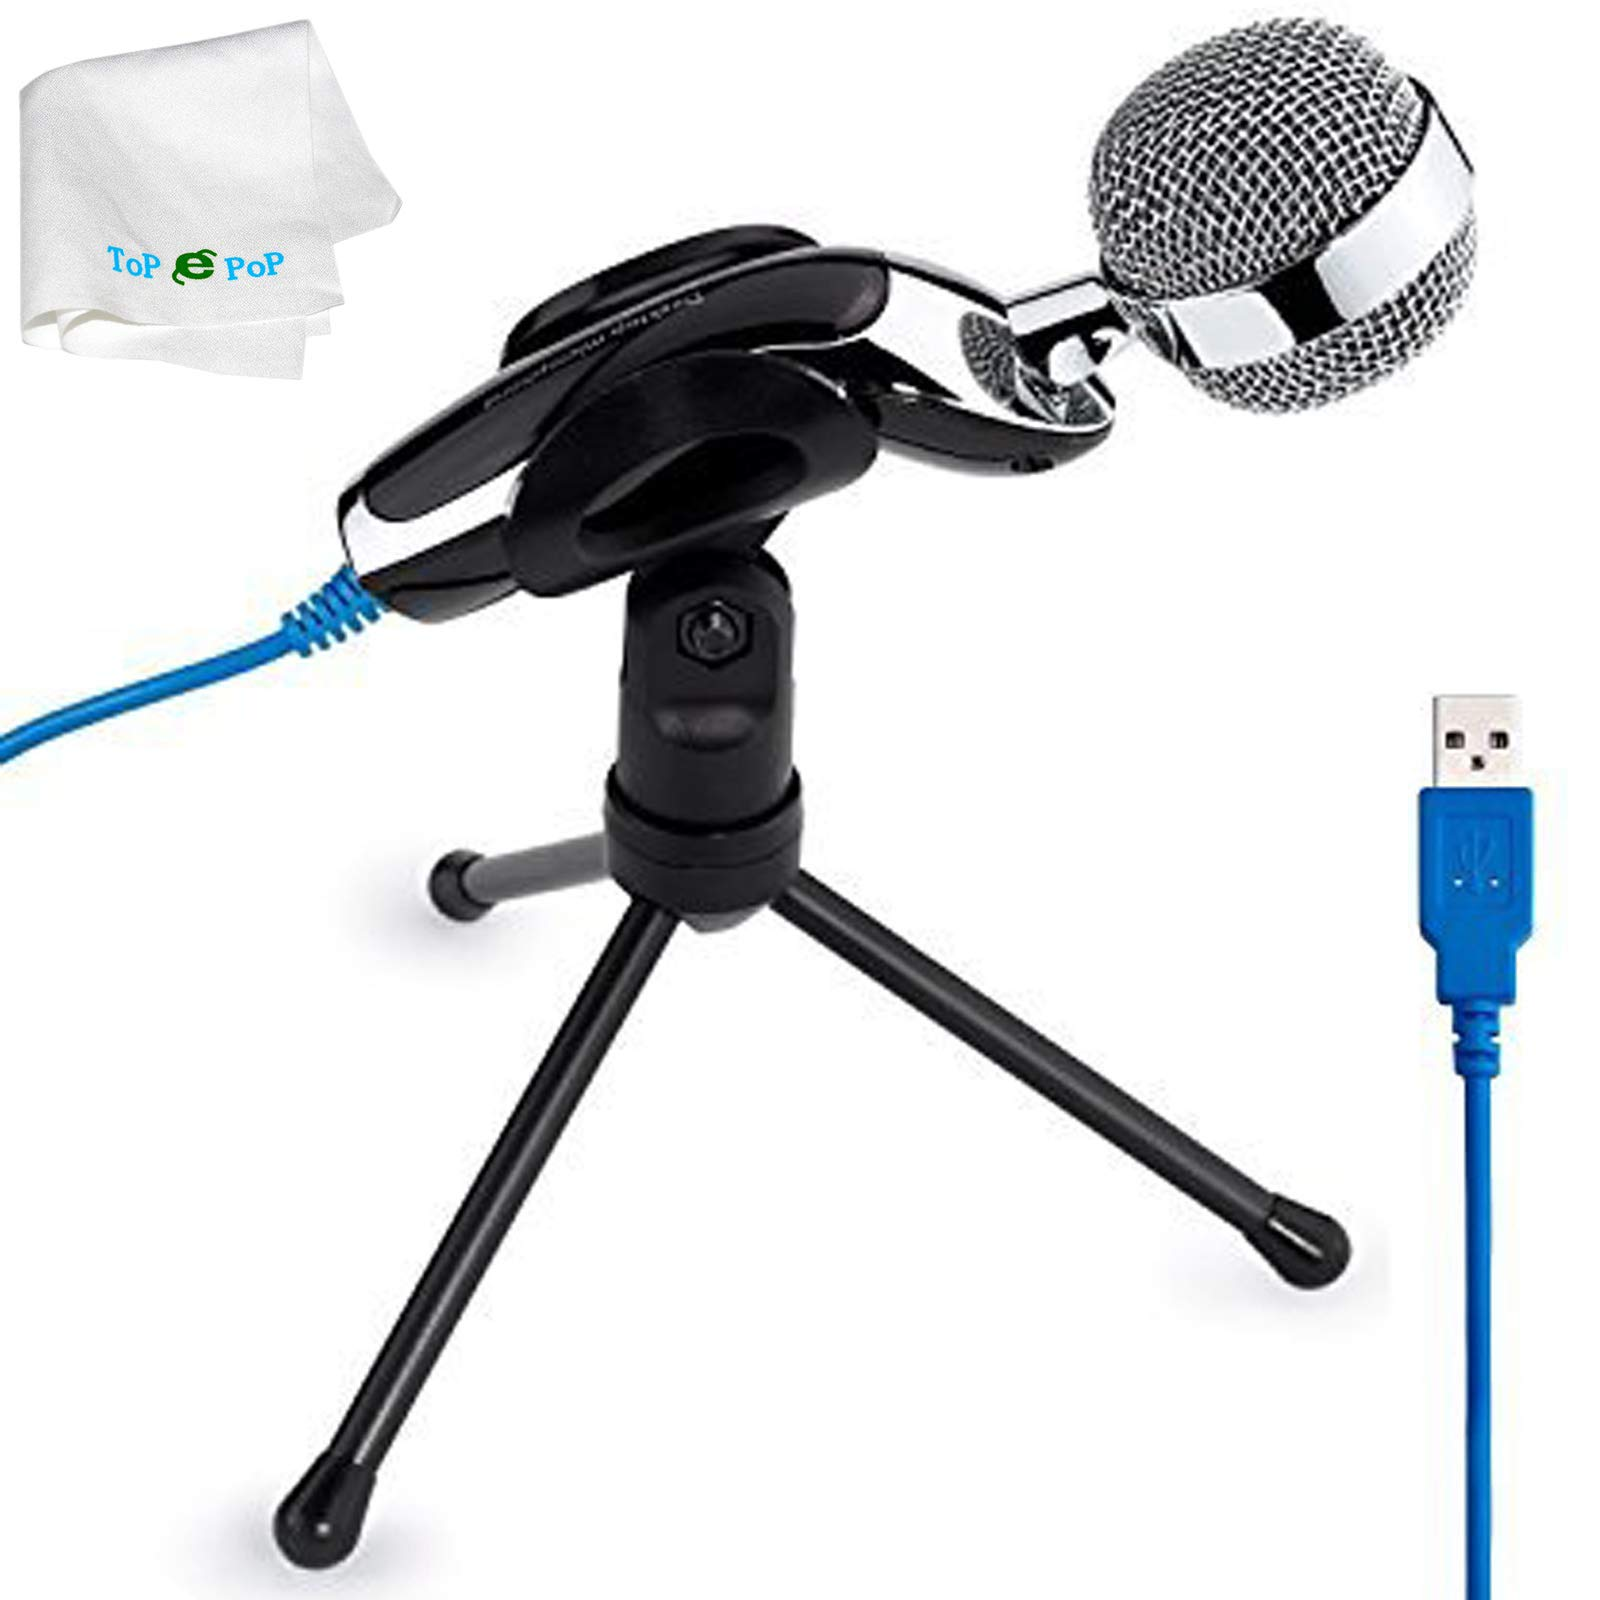 Usb Microfono De Condensador Profesional Mini Microfono De Escritorio Altavoz Audio De Estudio Grabacion De Sonido Con S